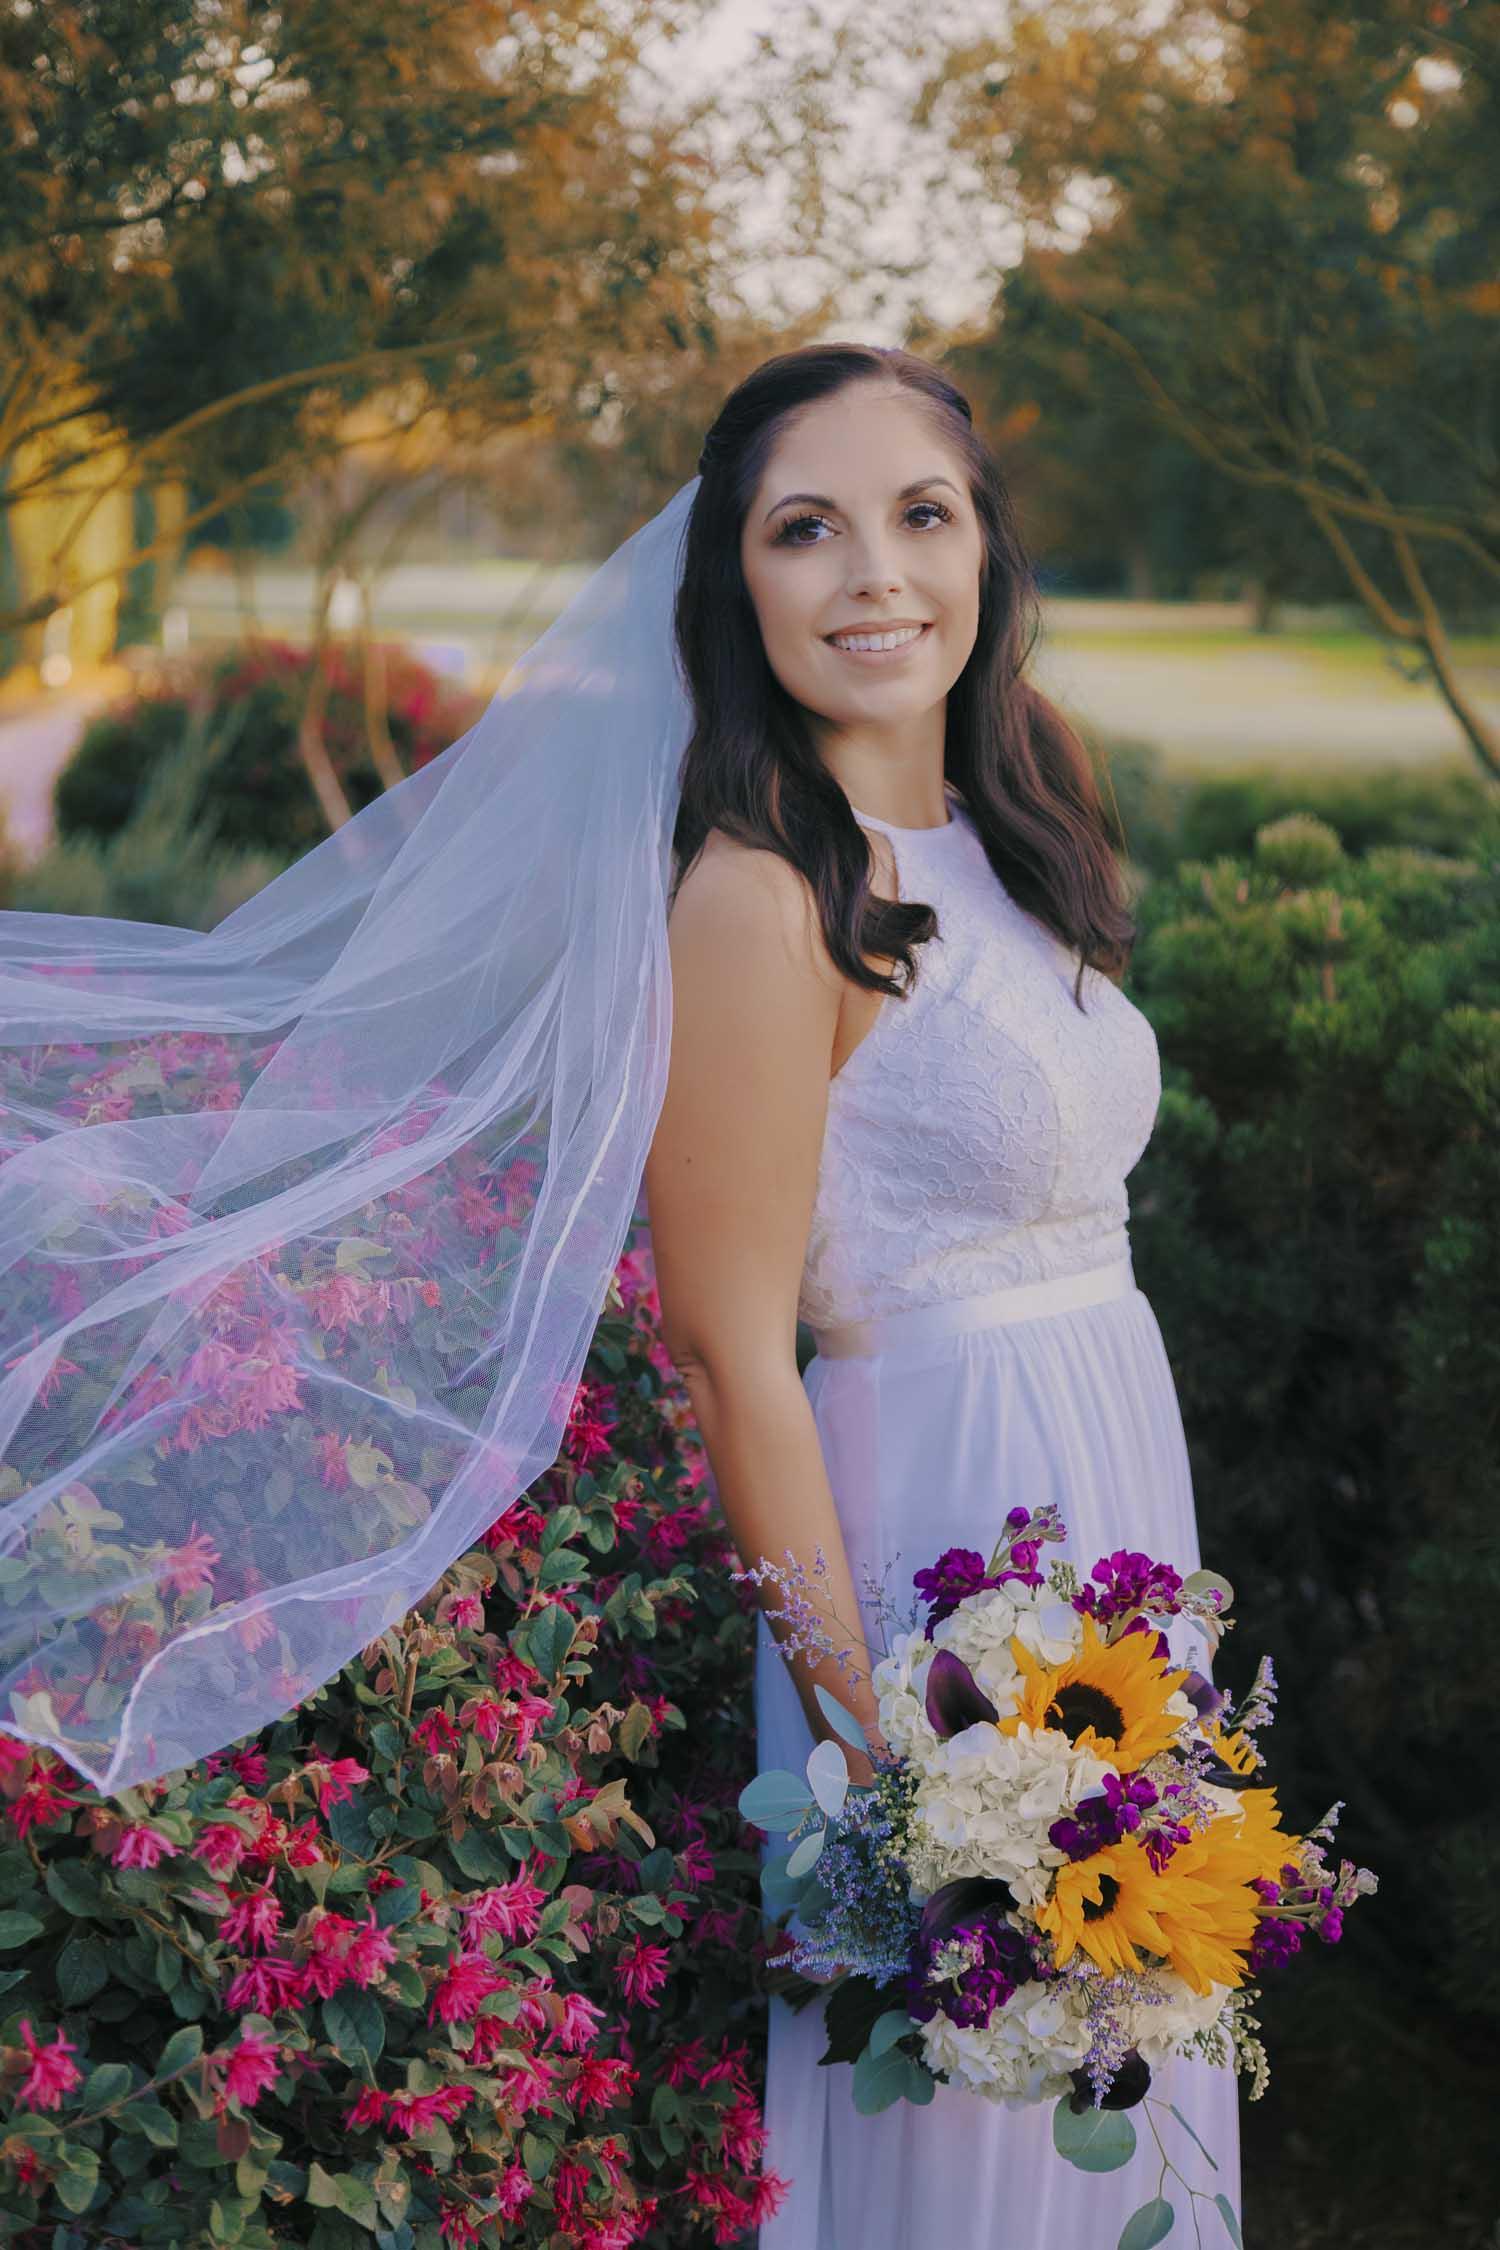 Bonnie-Scott-Rustic-Wedding-Chico-Ca-Butte-Creek-Country-Club243.jpg